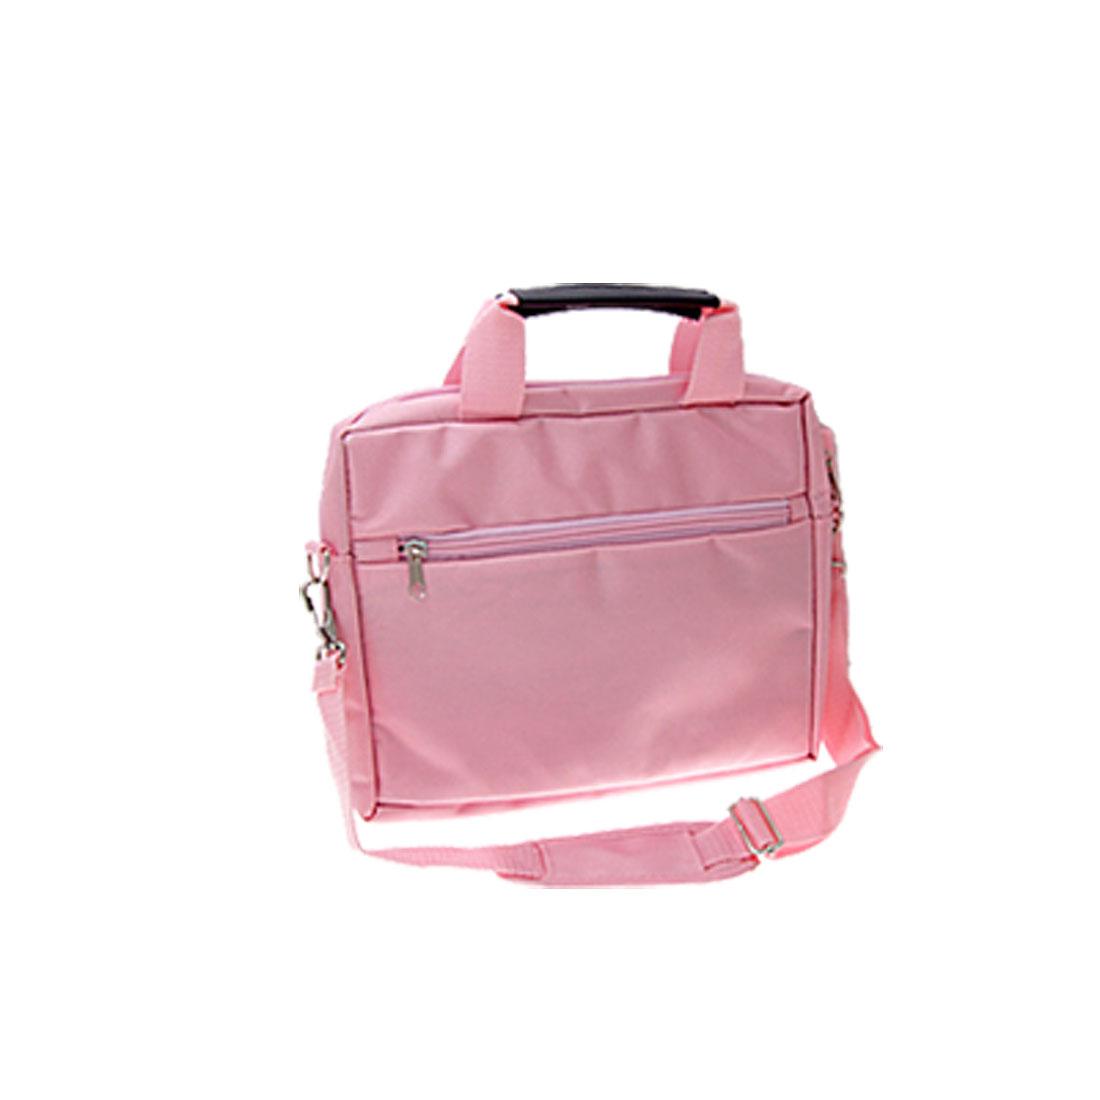 "10"" 10.1"" 10.2"" Pink Notebook Laptop Shoulder Bag Carrying Case for HP Mini 110 210"